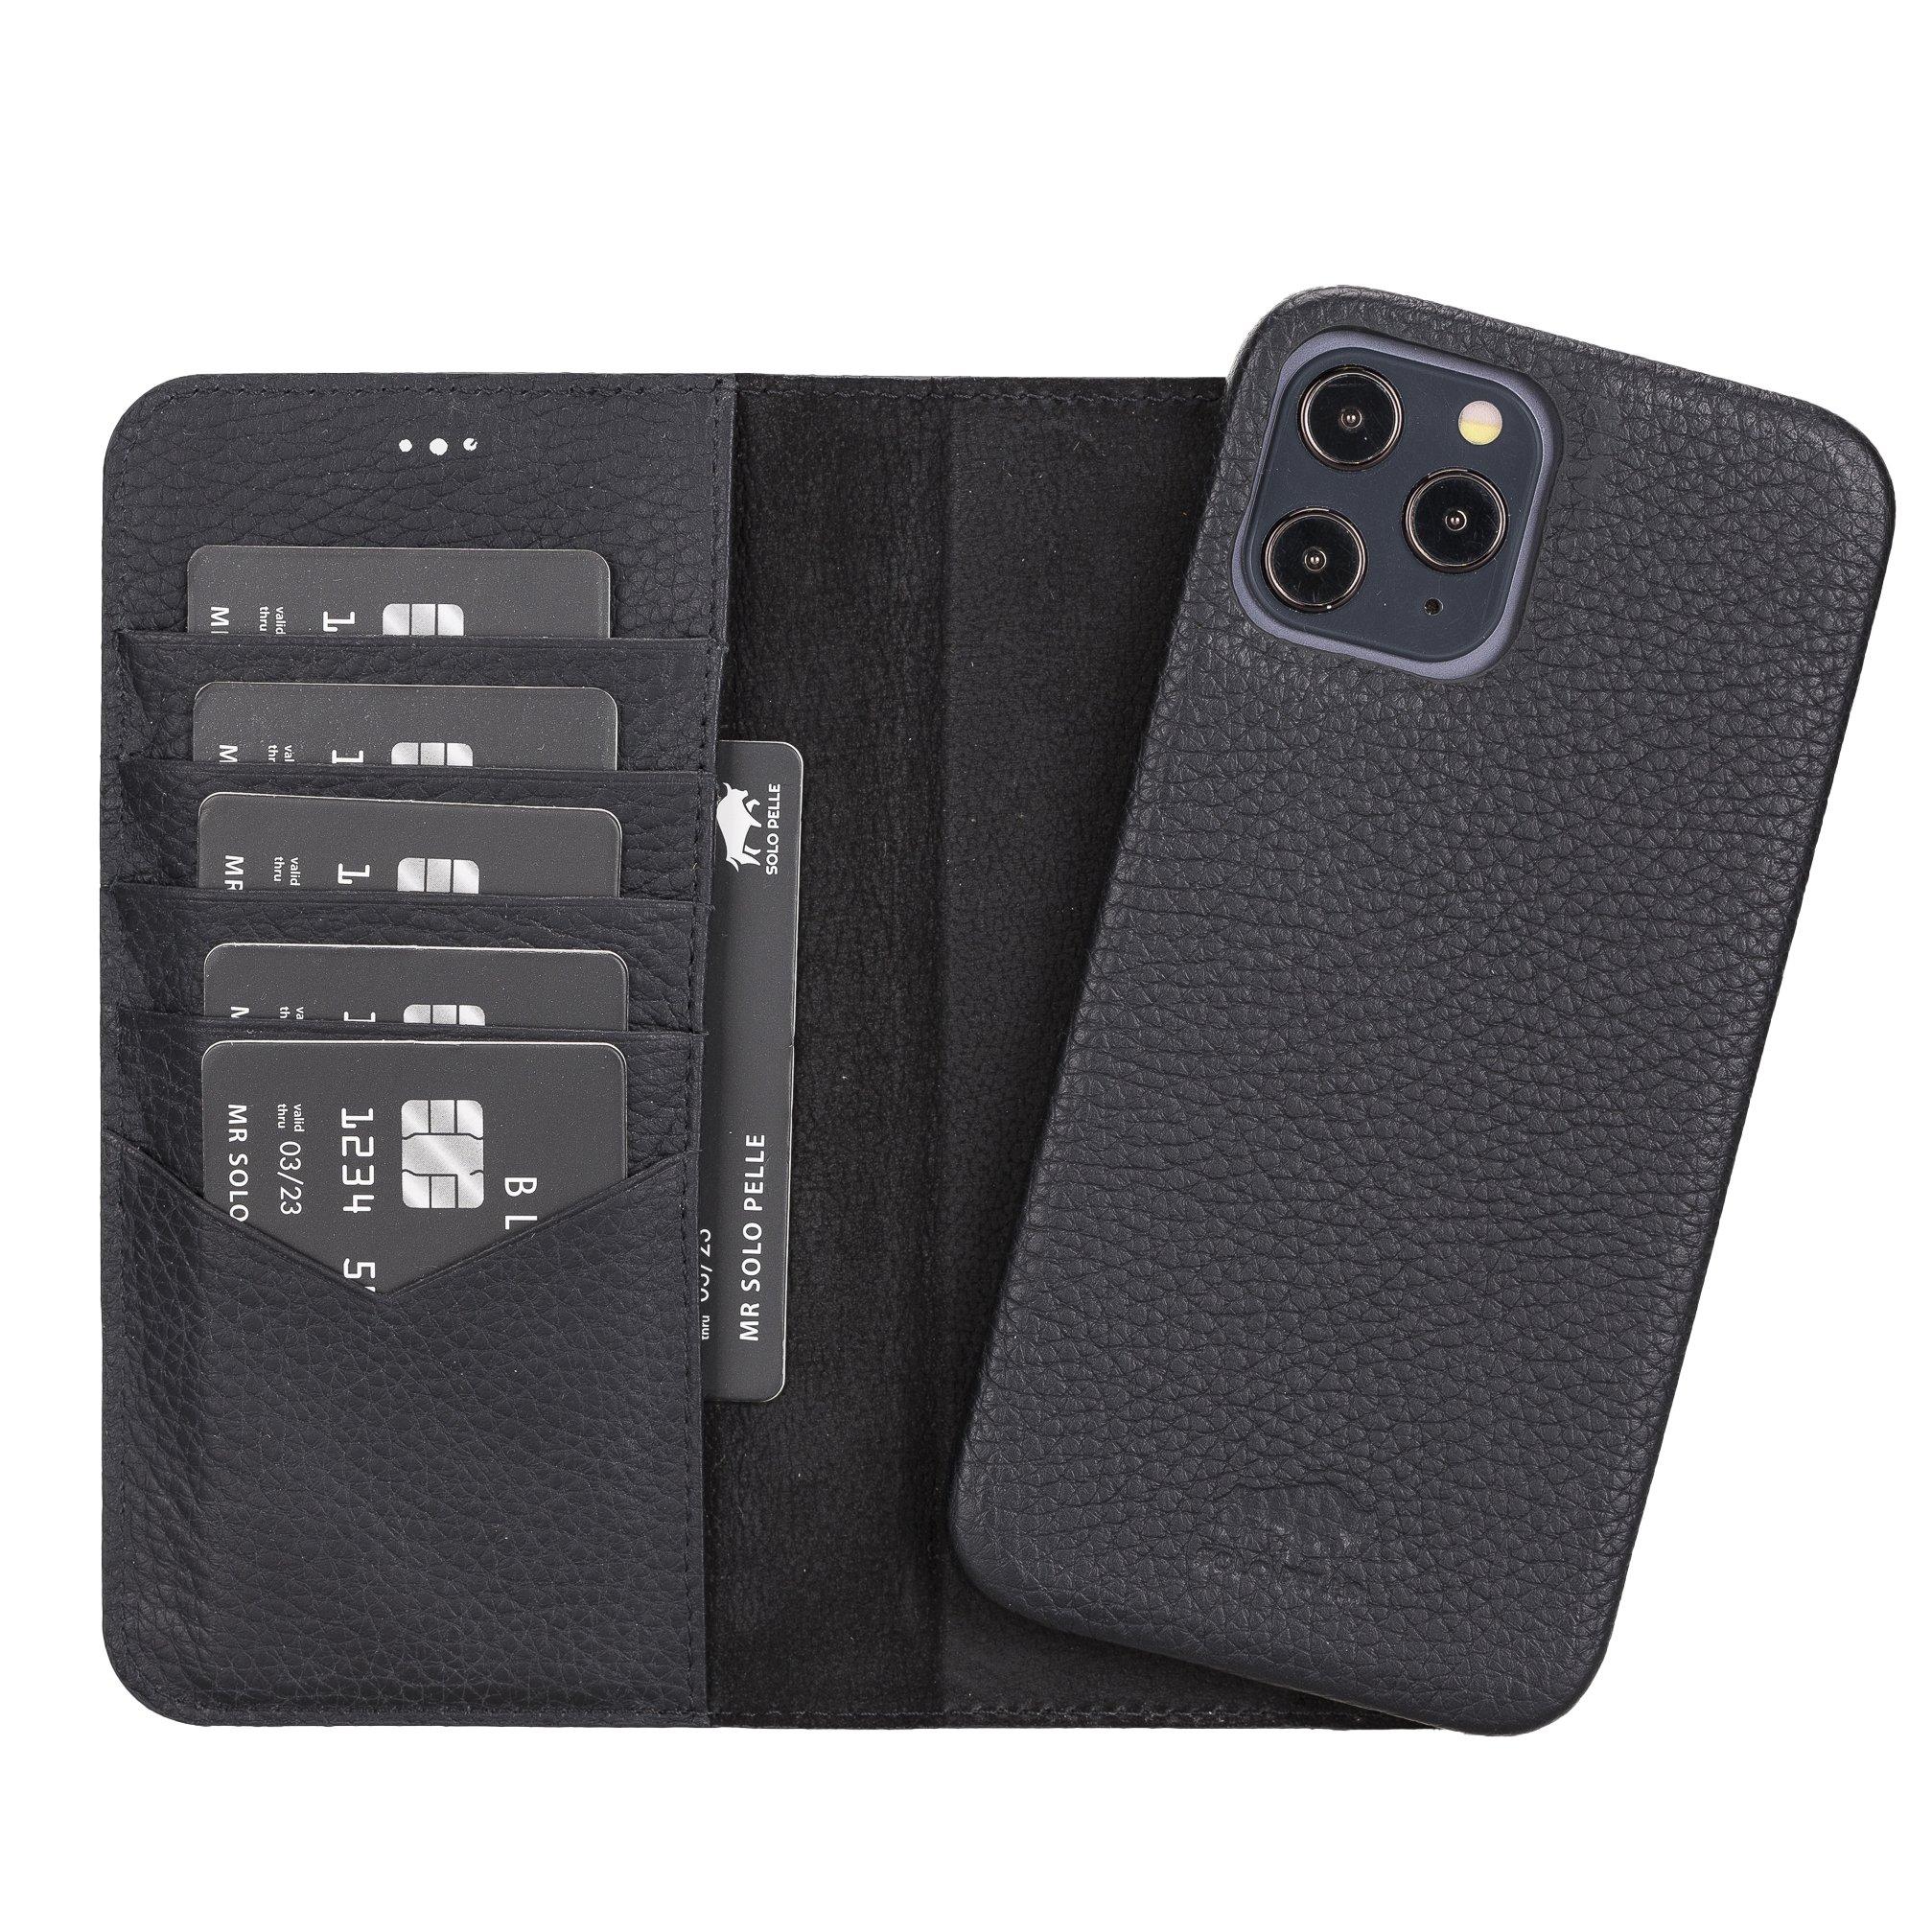 "iPhone 12 Pro Max abnehmbare Lederhülle ""Clemson"" MagSafe kompatibel (Vollleder Matt Schwarz)"